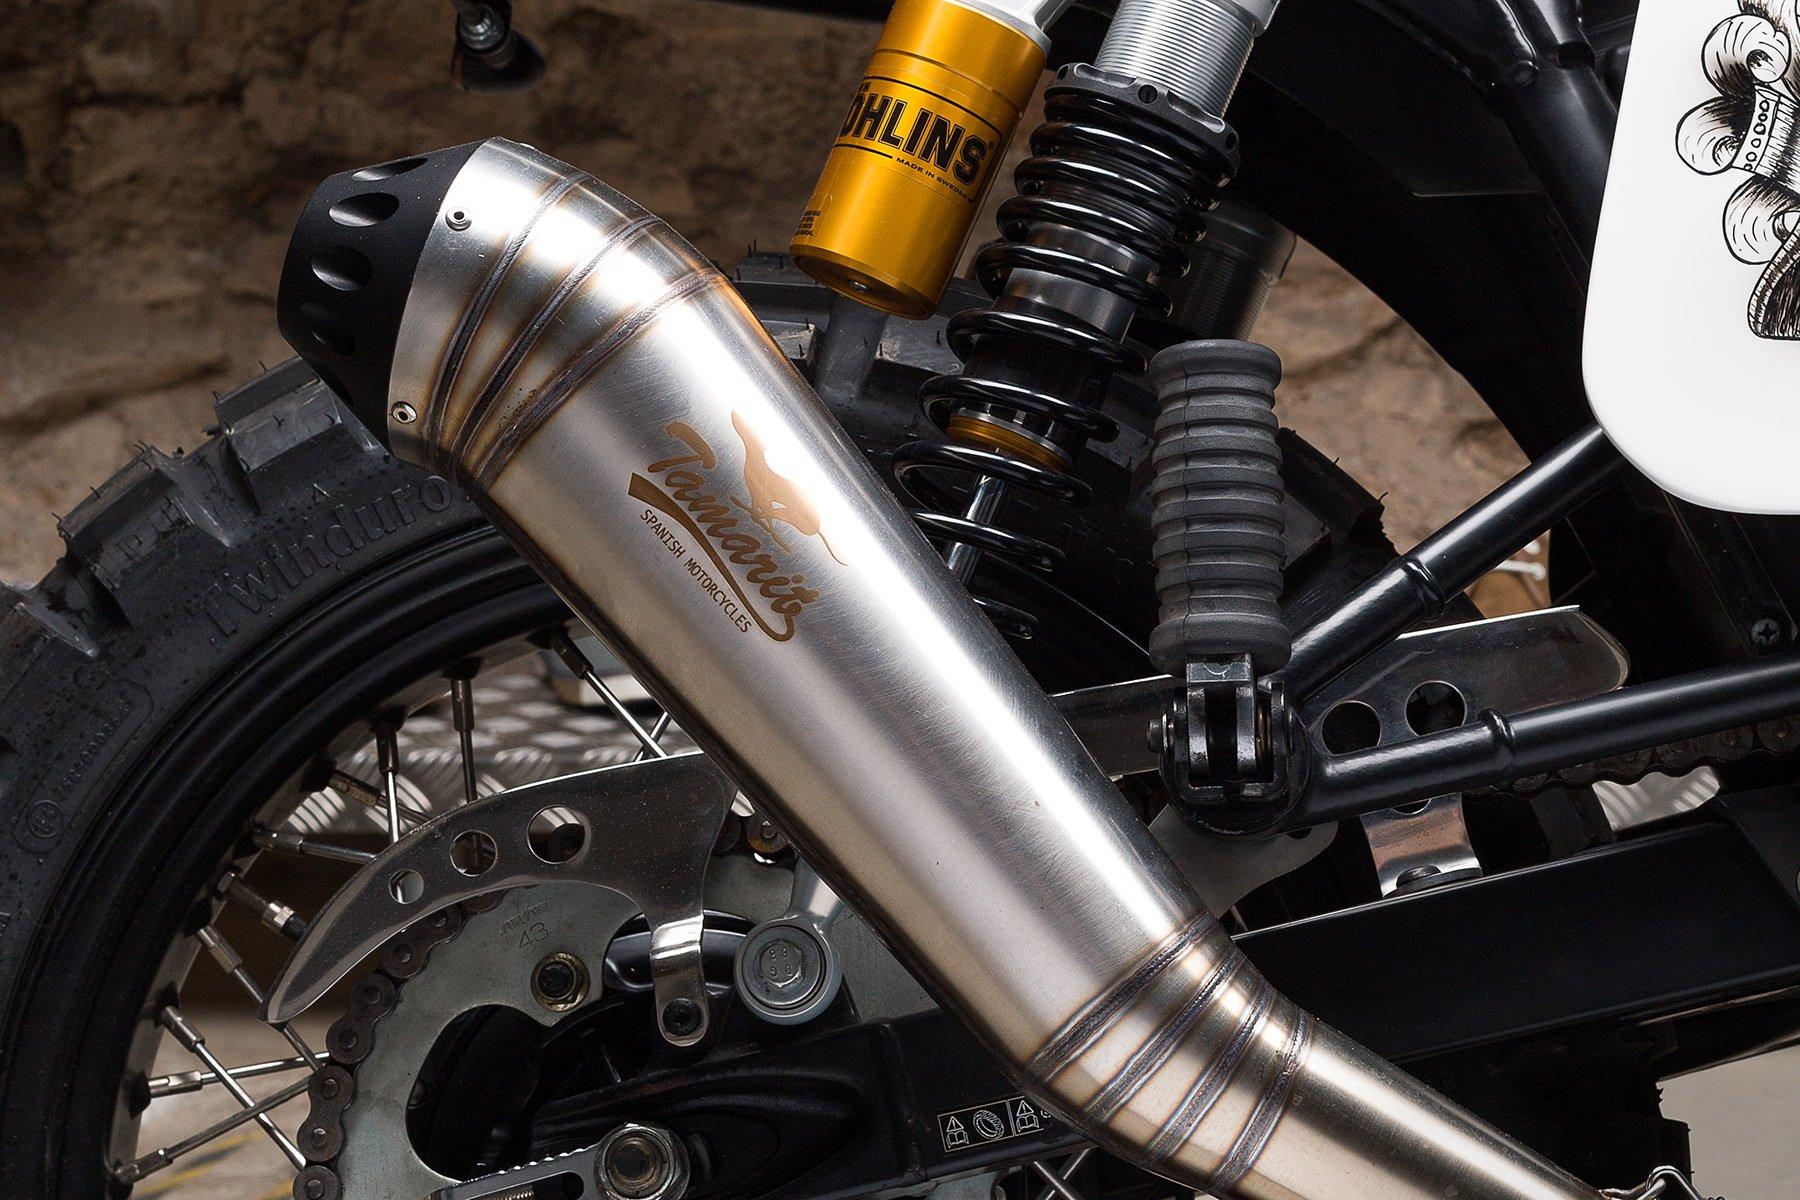 Custom Triumph Scrambler Motorcycle 6